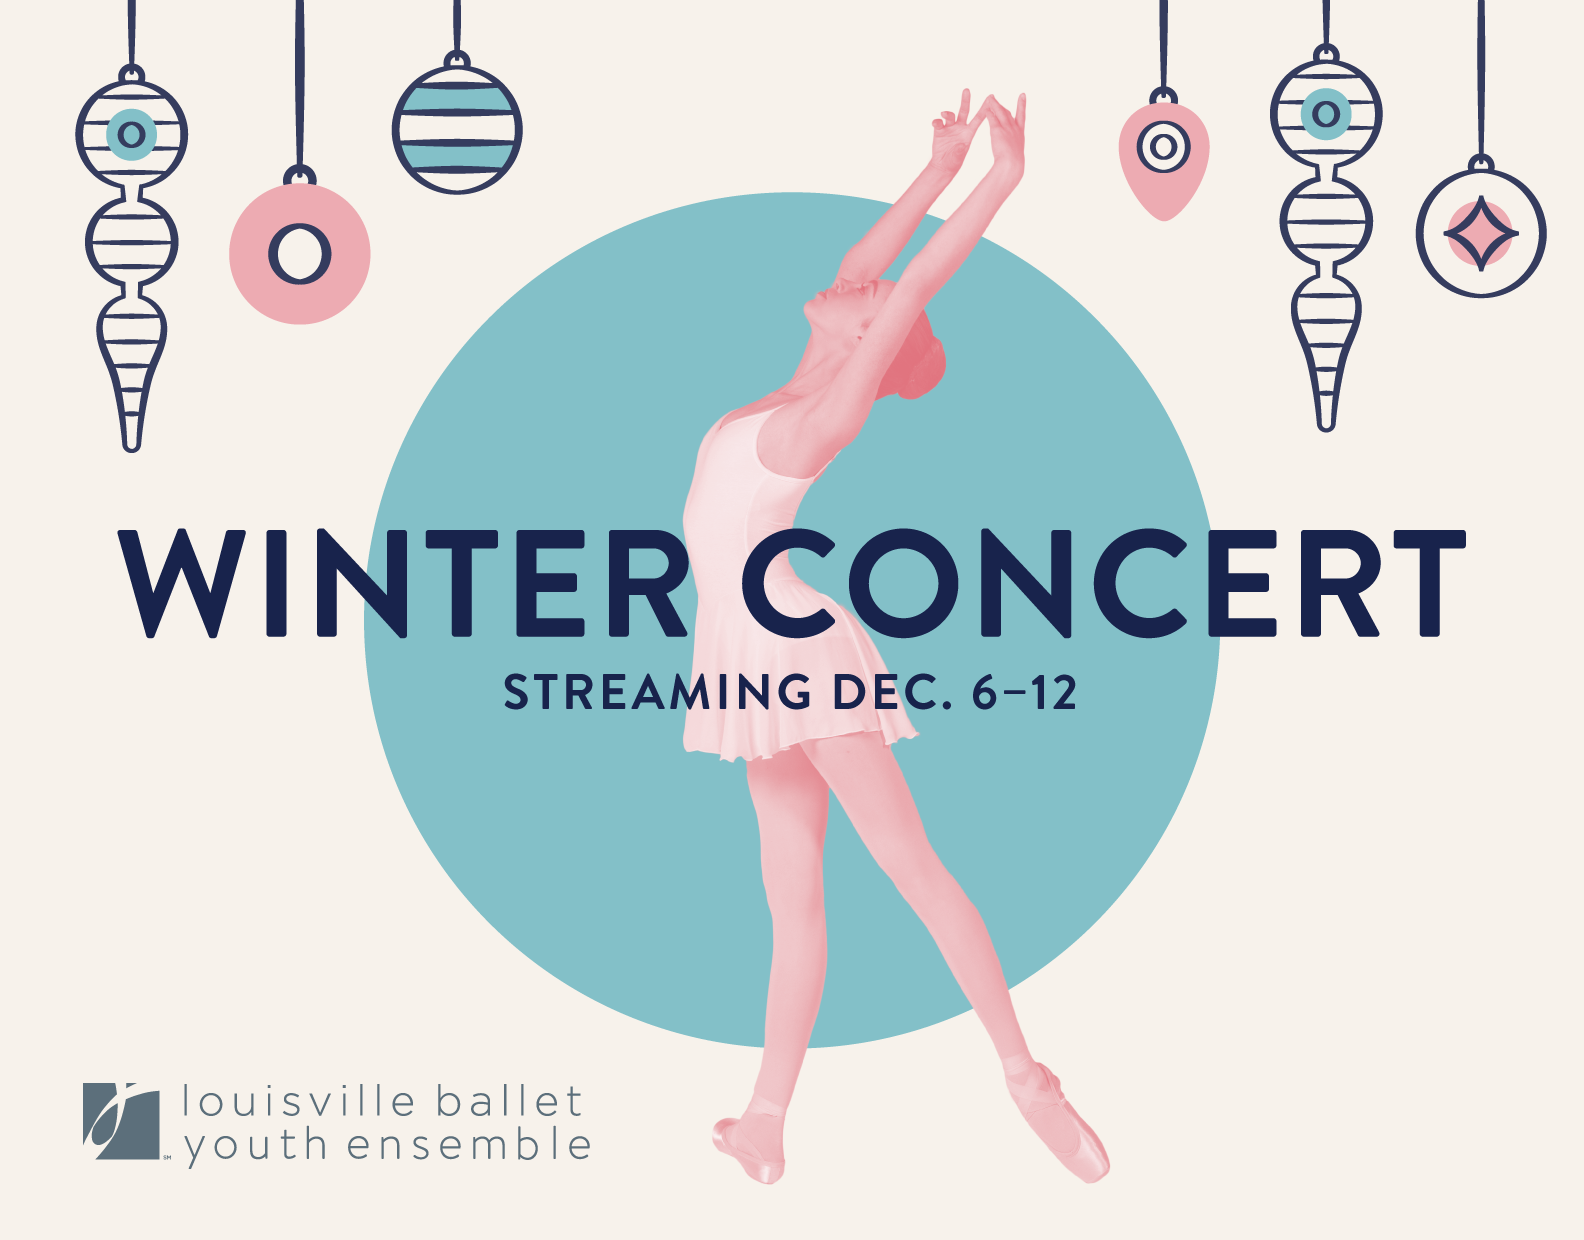 Louisville Ballet Youth Ensemble Winter Concert